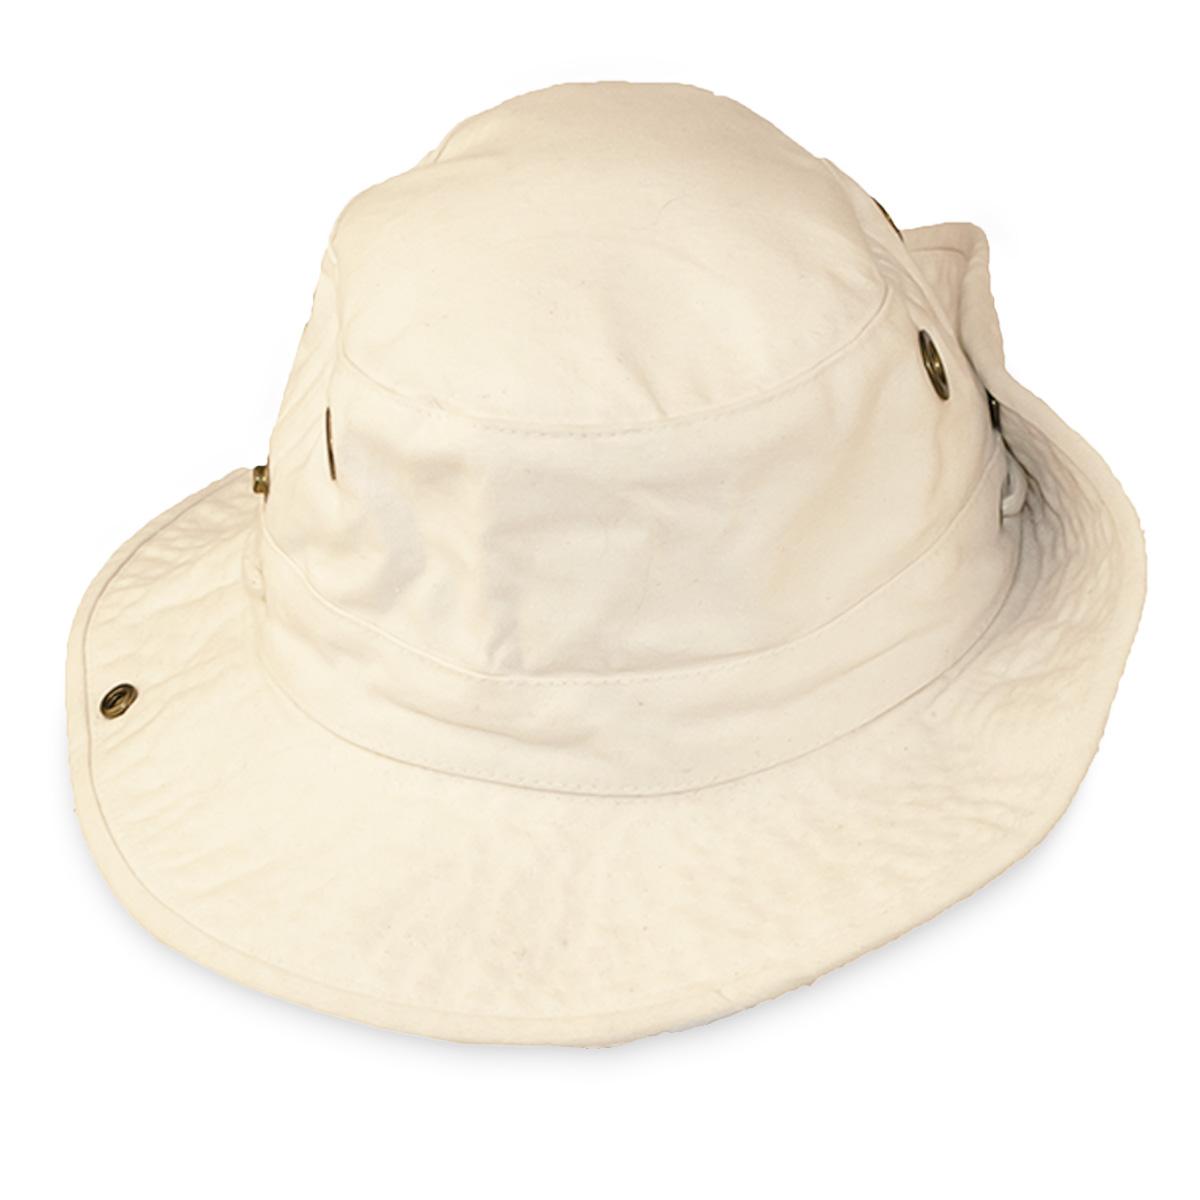 hats for men